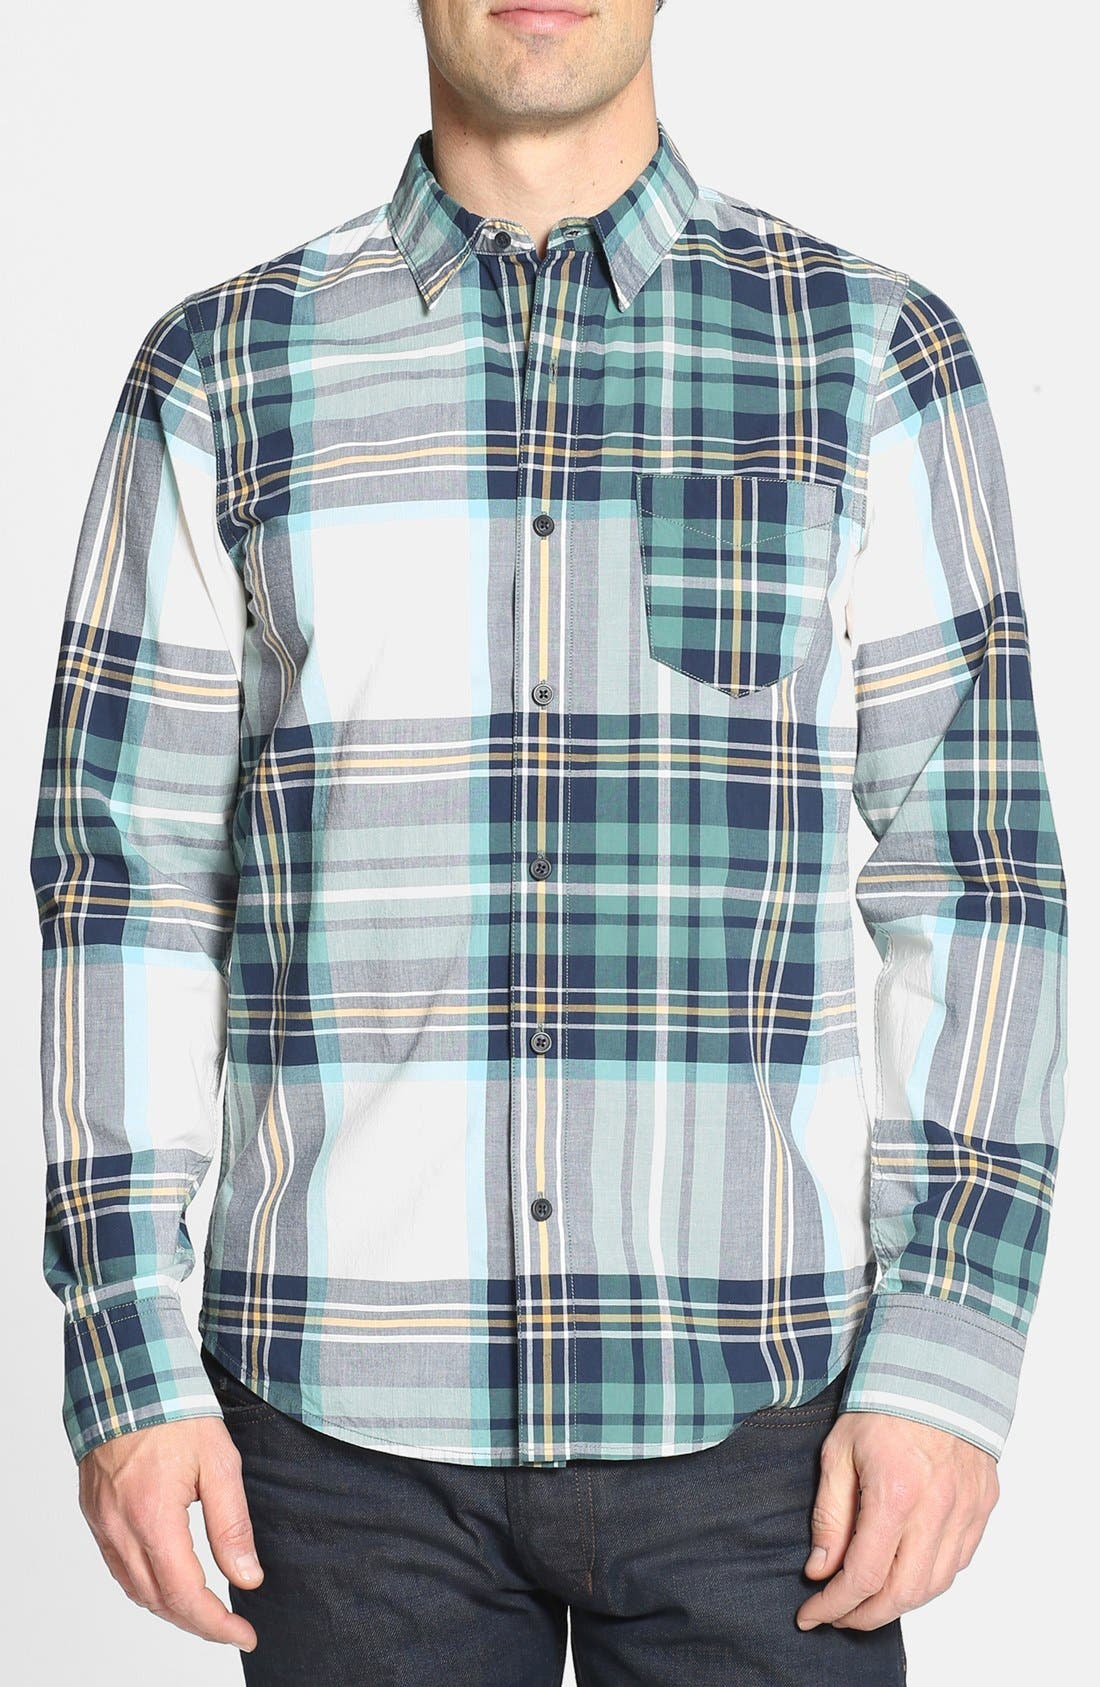 Main Image - 1901 Plaid Poplin Cotton Shirt